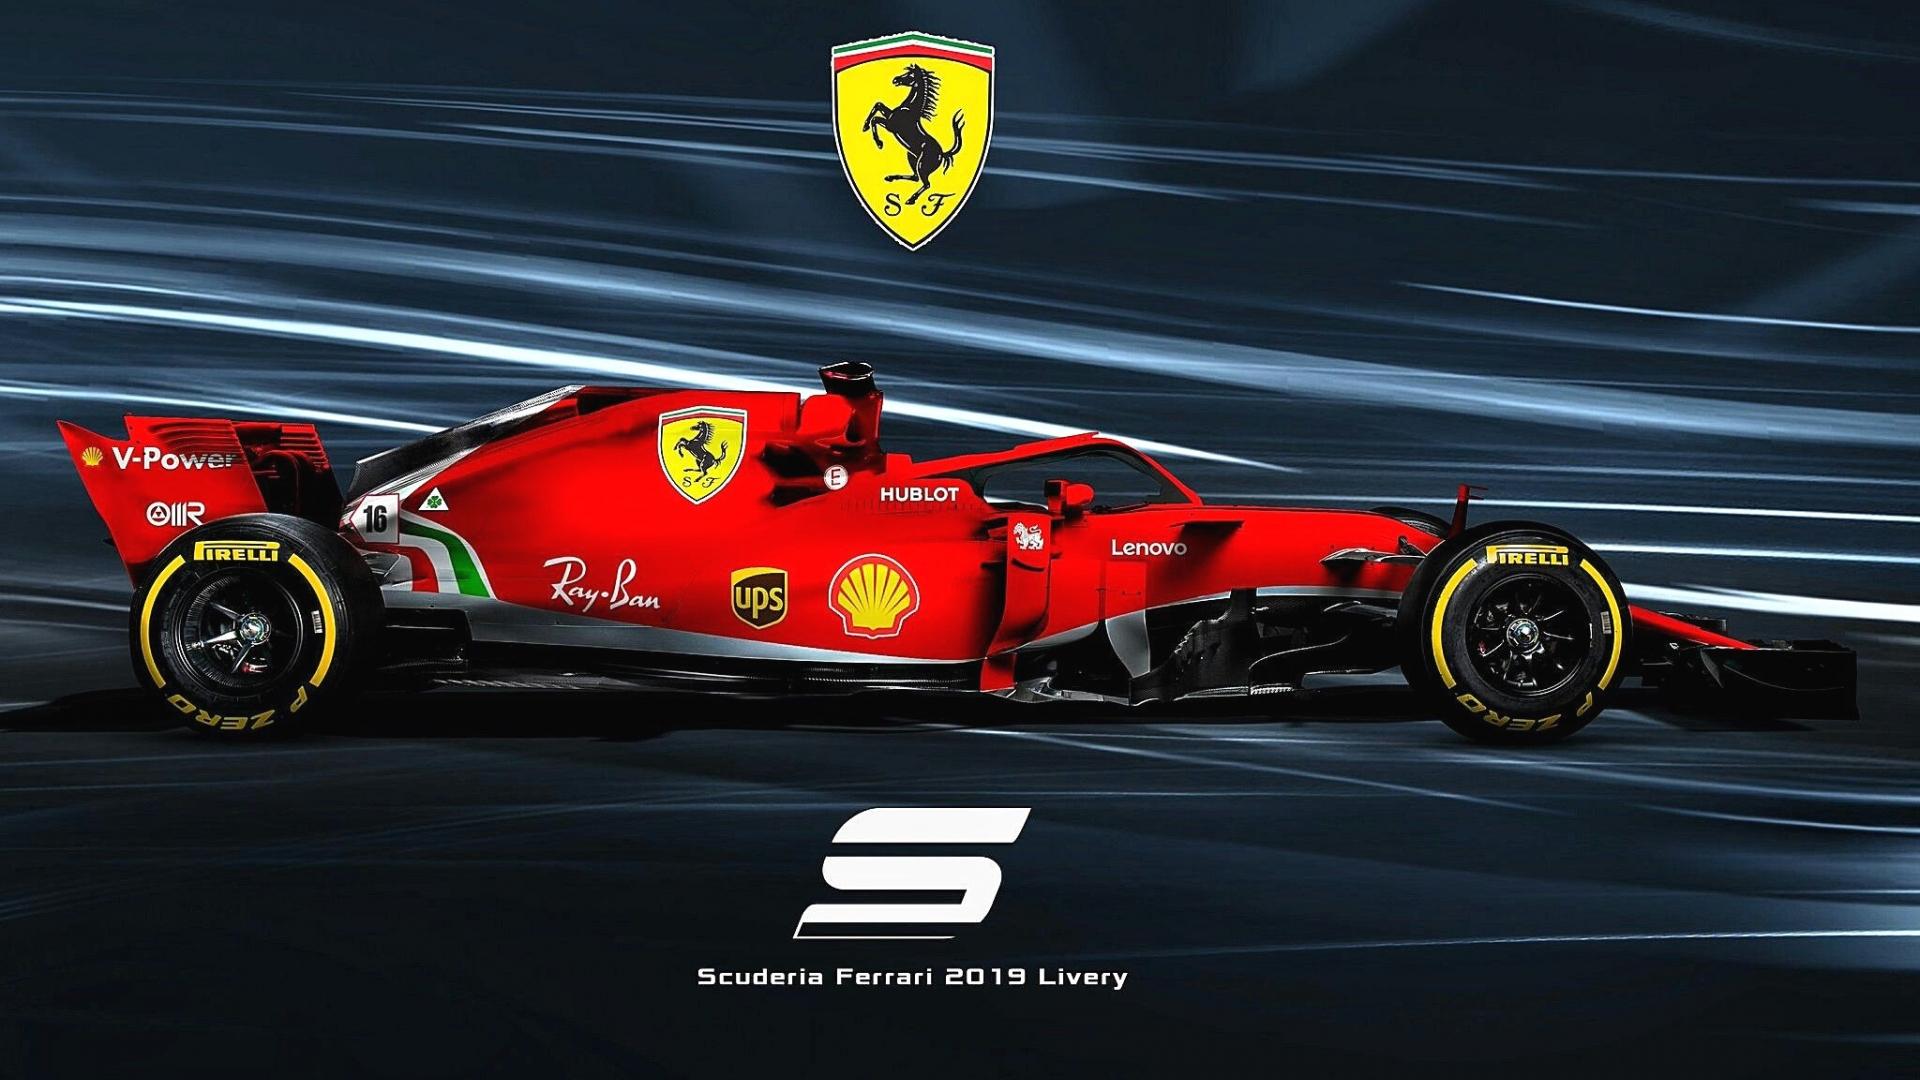 F1 2020 Wallpapers - Wallpaper Cave